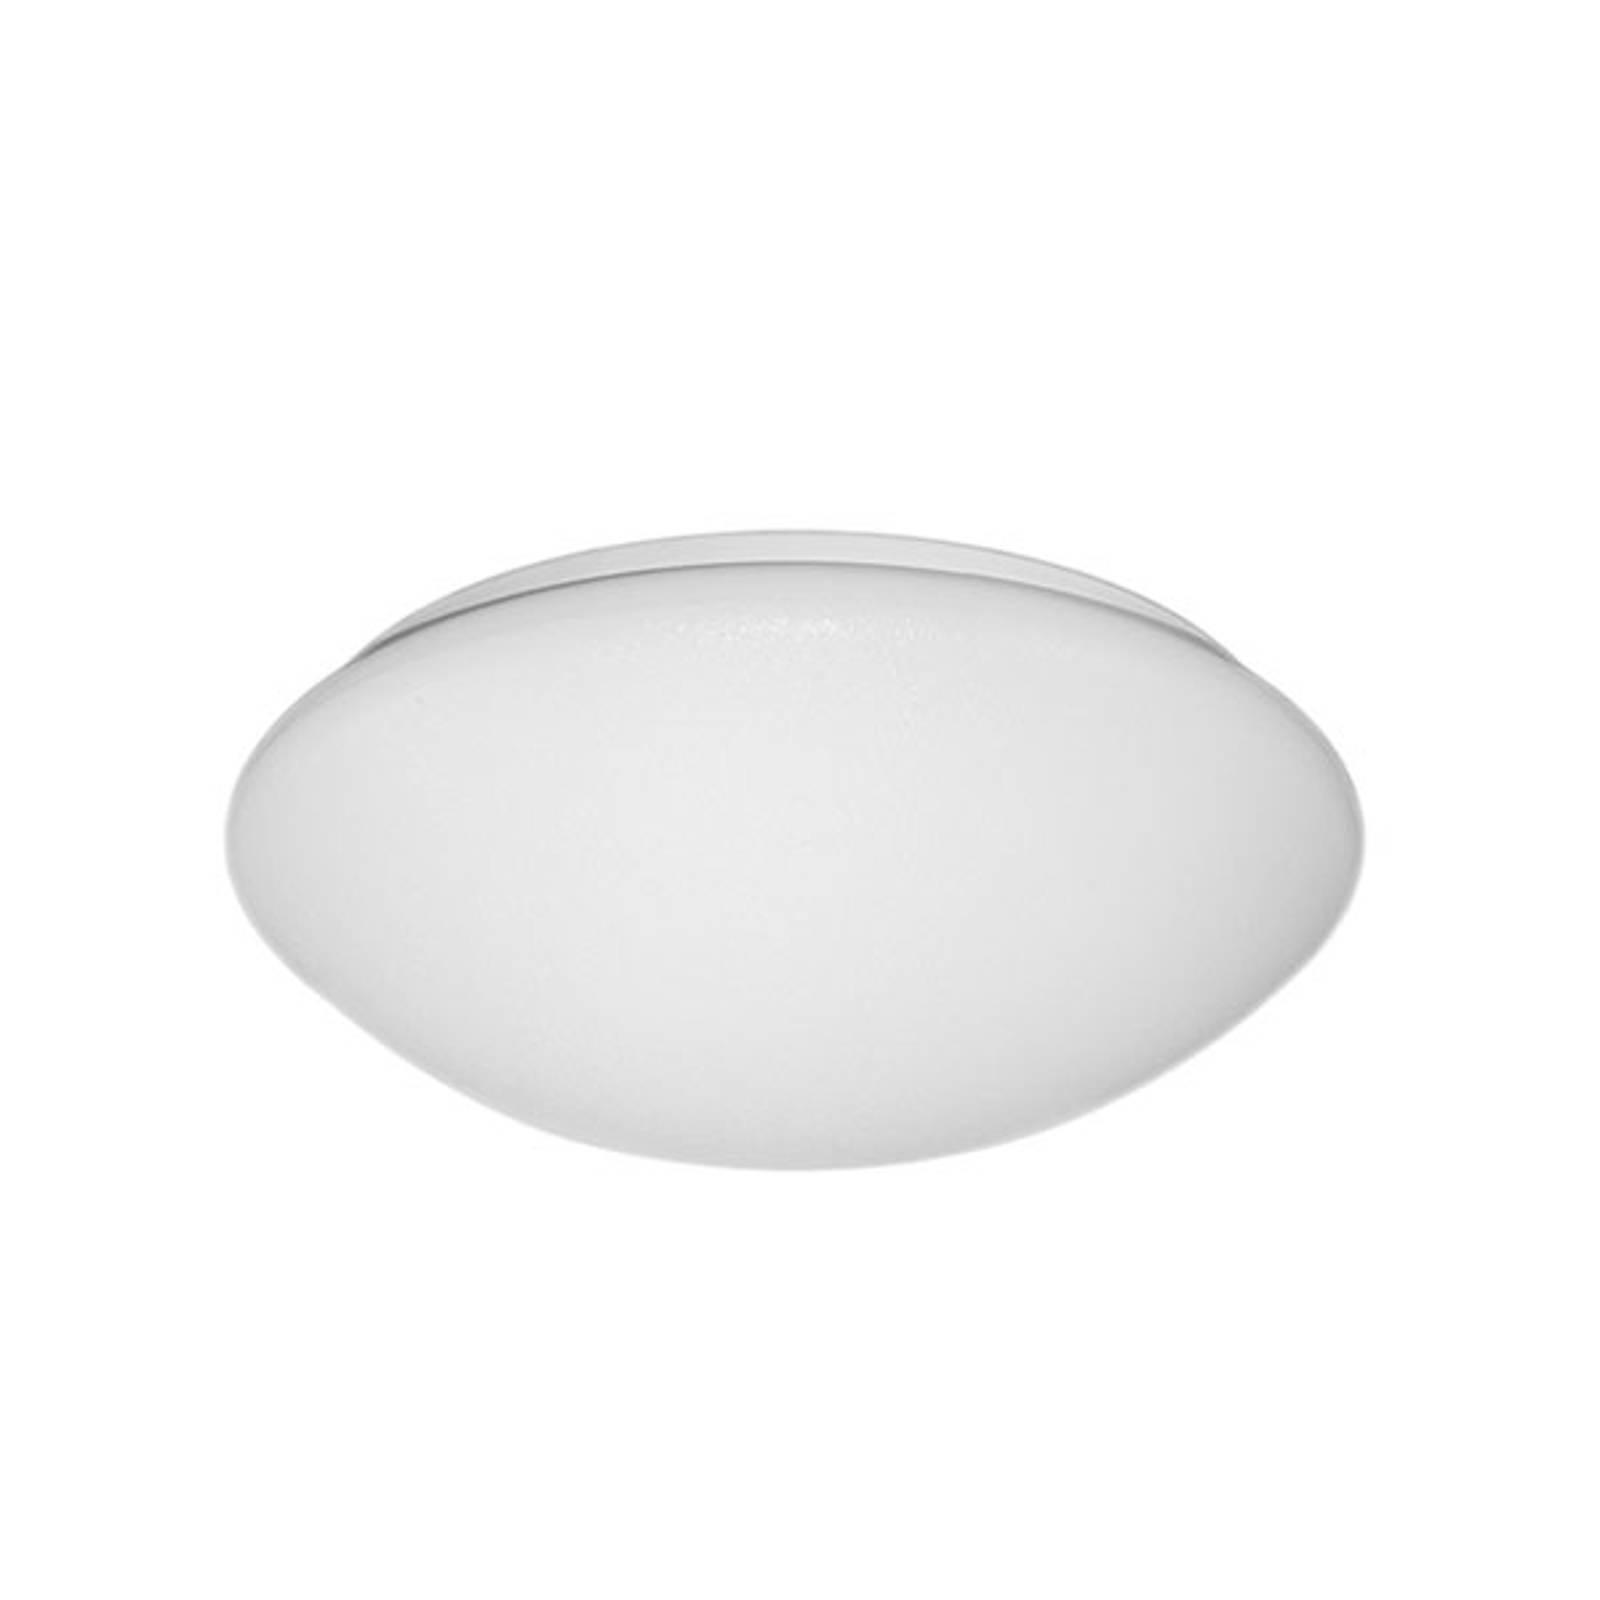 Lampada LED a superficie, 14 W 3000 K